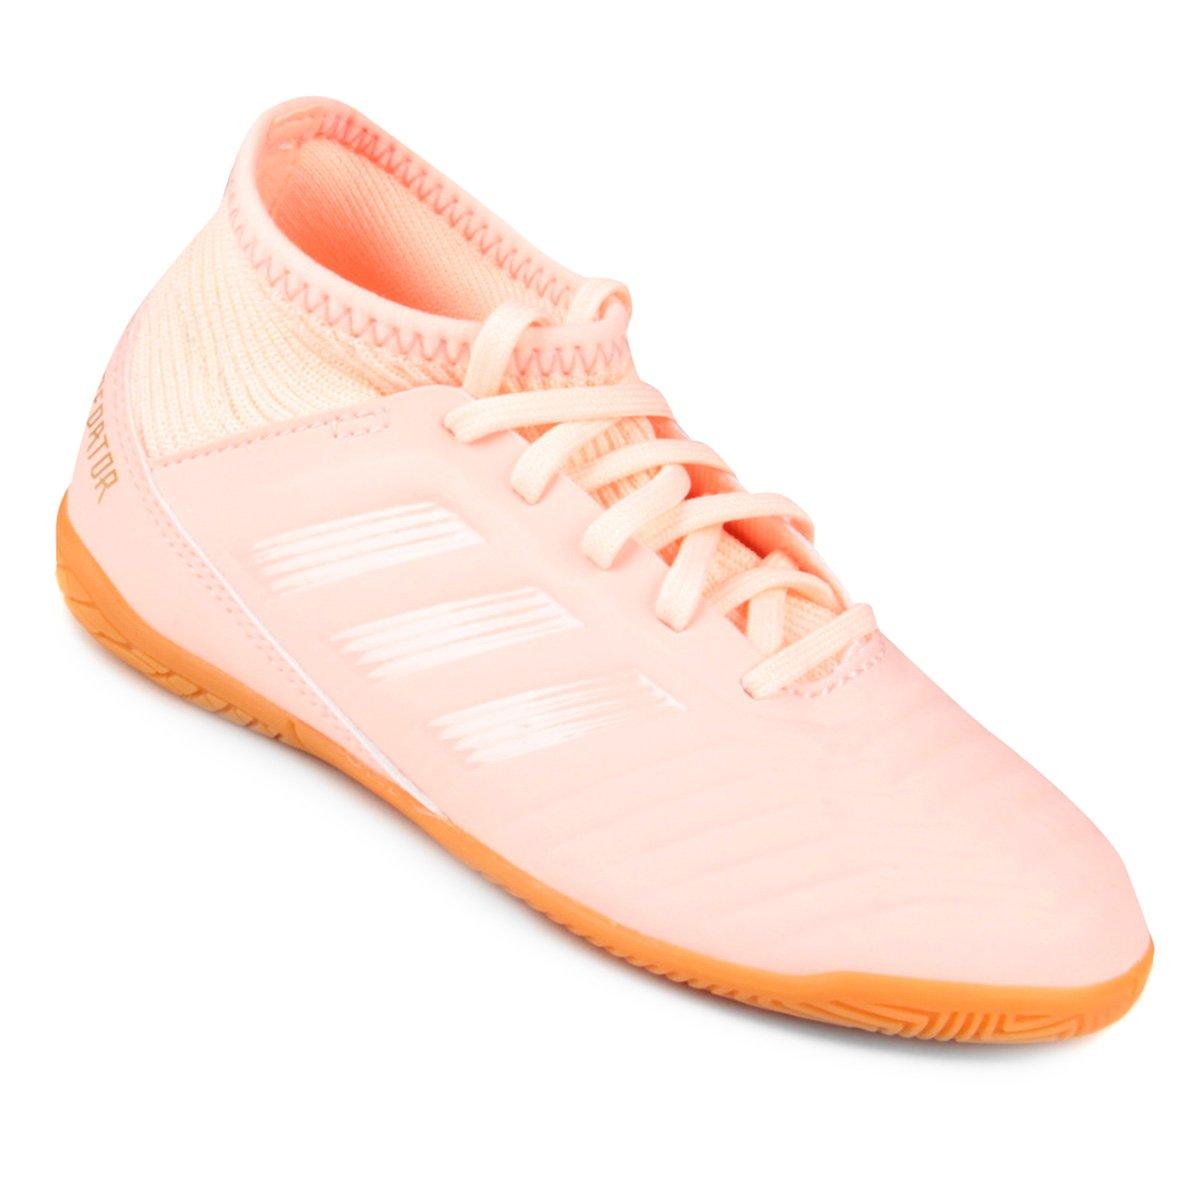 bae96e259e1cb Chuteira Futsal Infantil Adidas Predator 18 3 IN - Compre Agora ...